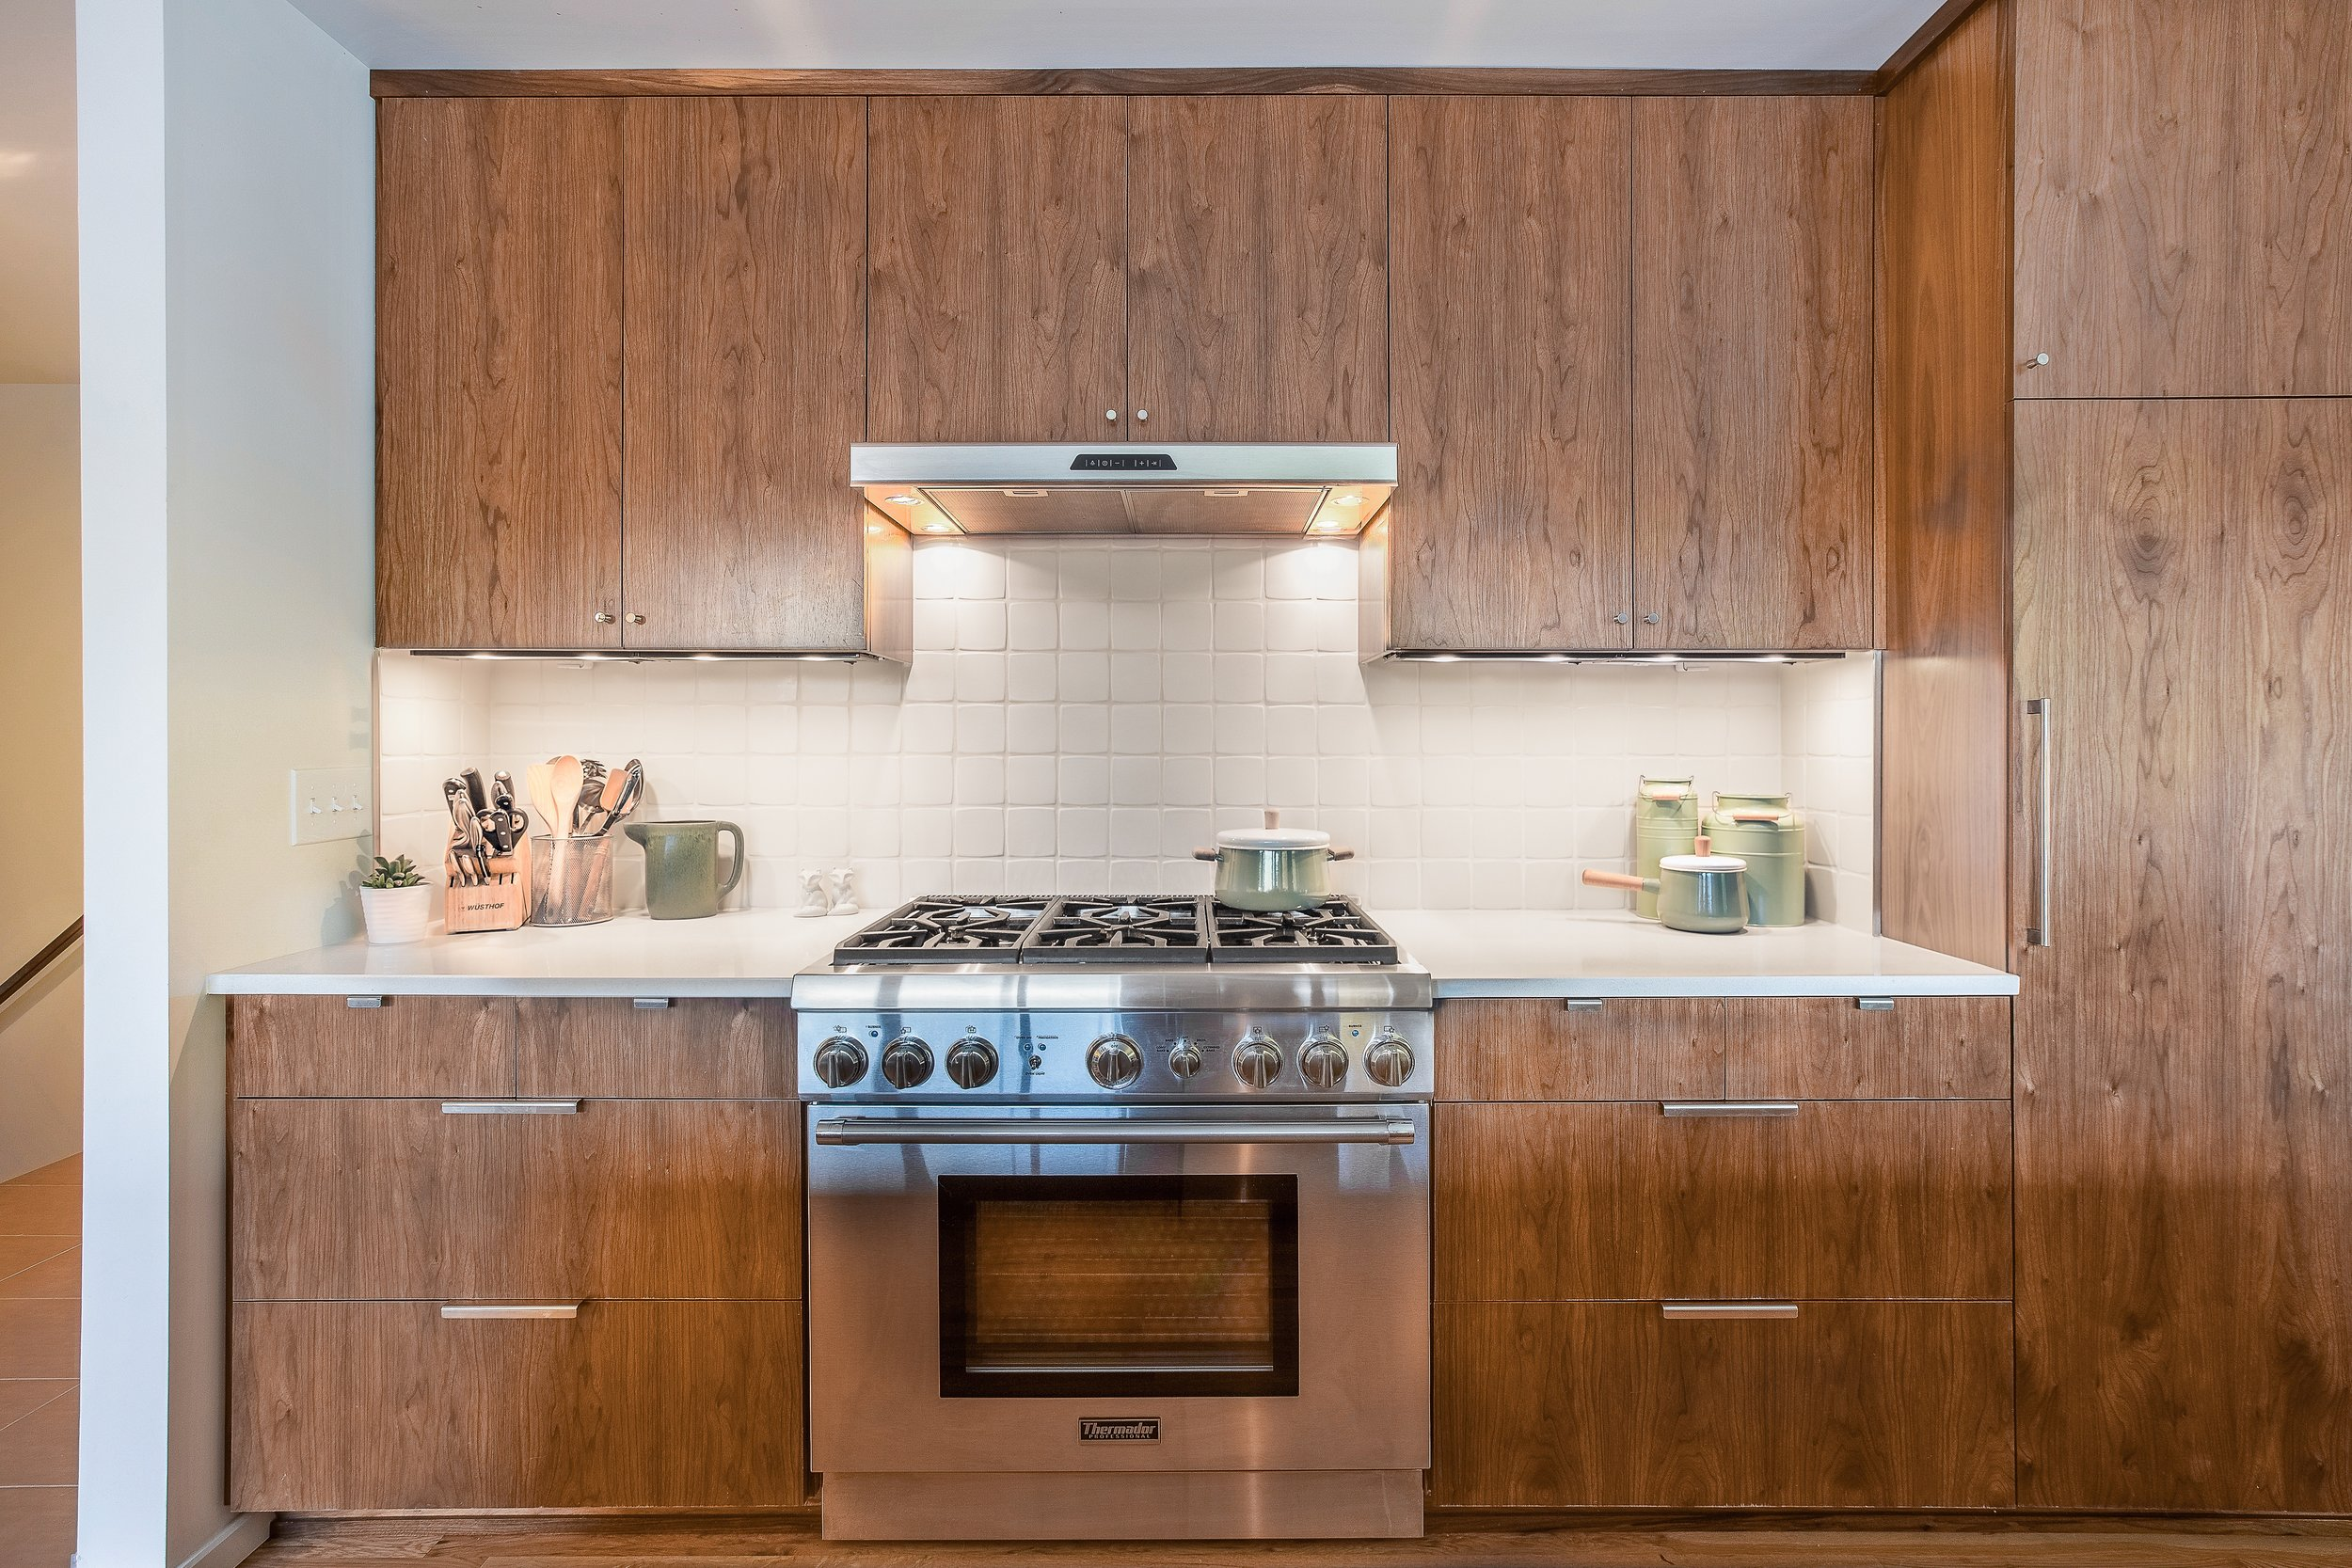 Smith_Hayes_Brothers_Construction_Portland_Oregon_Custom_Cabinets_Image